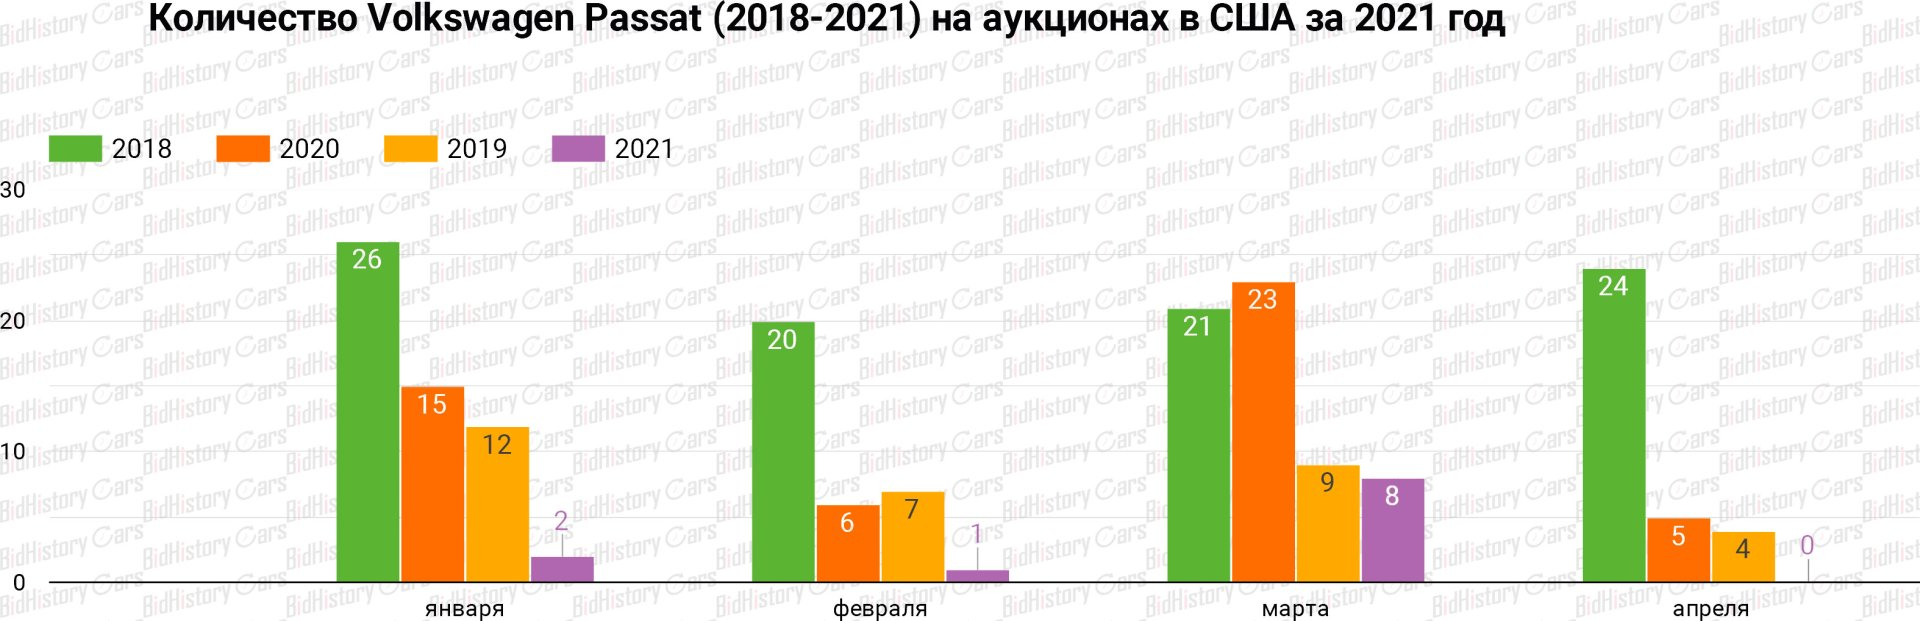 Количество Volkswagen Passat (2018-2021 года) на аукционах в США за 2021 год